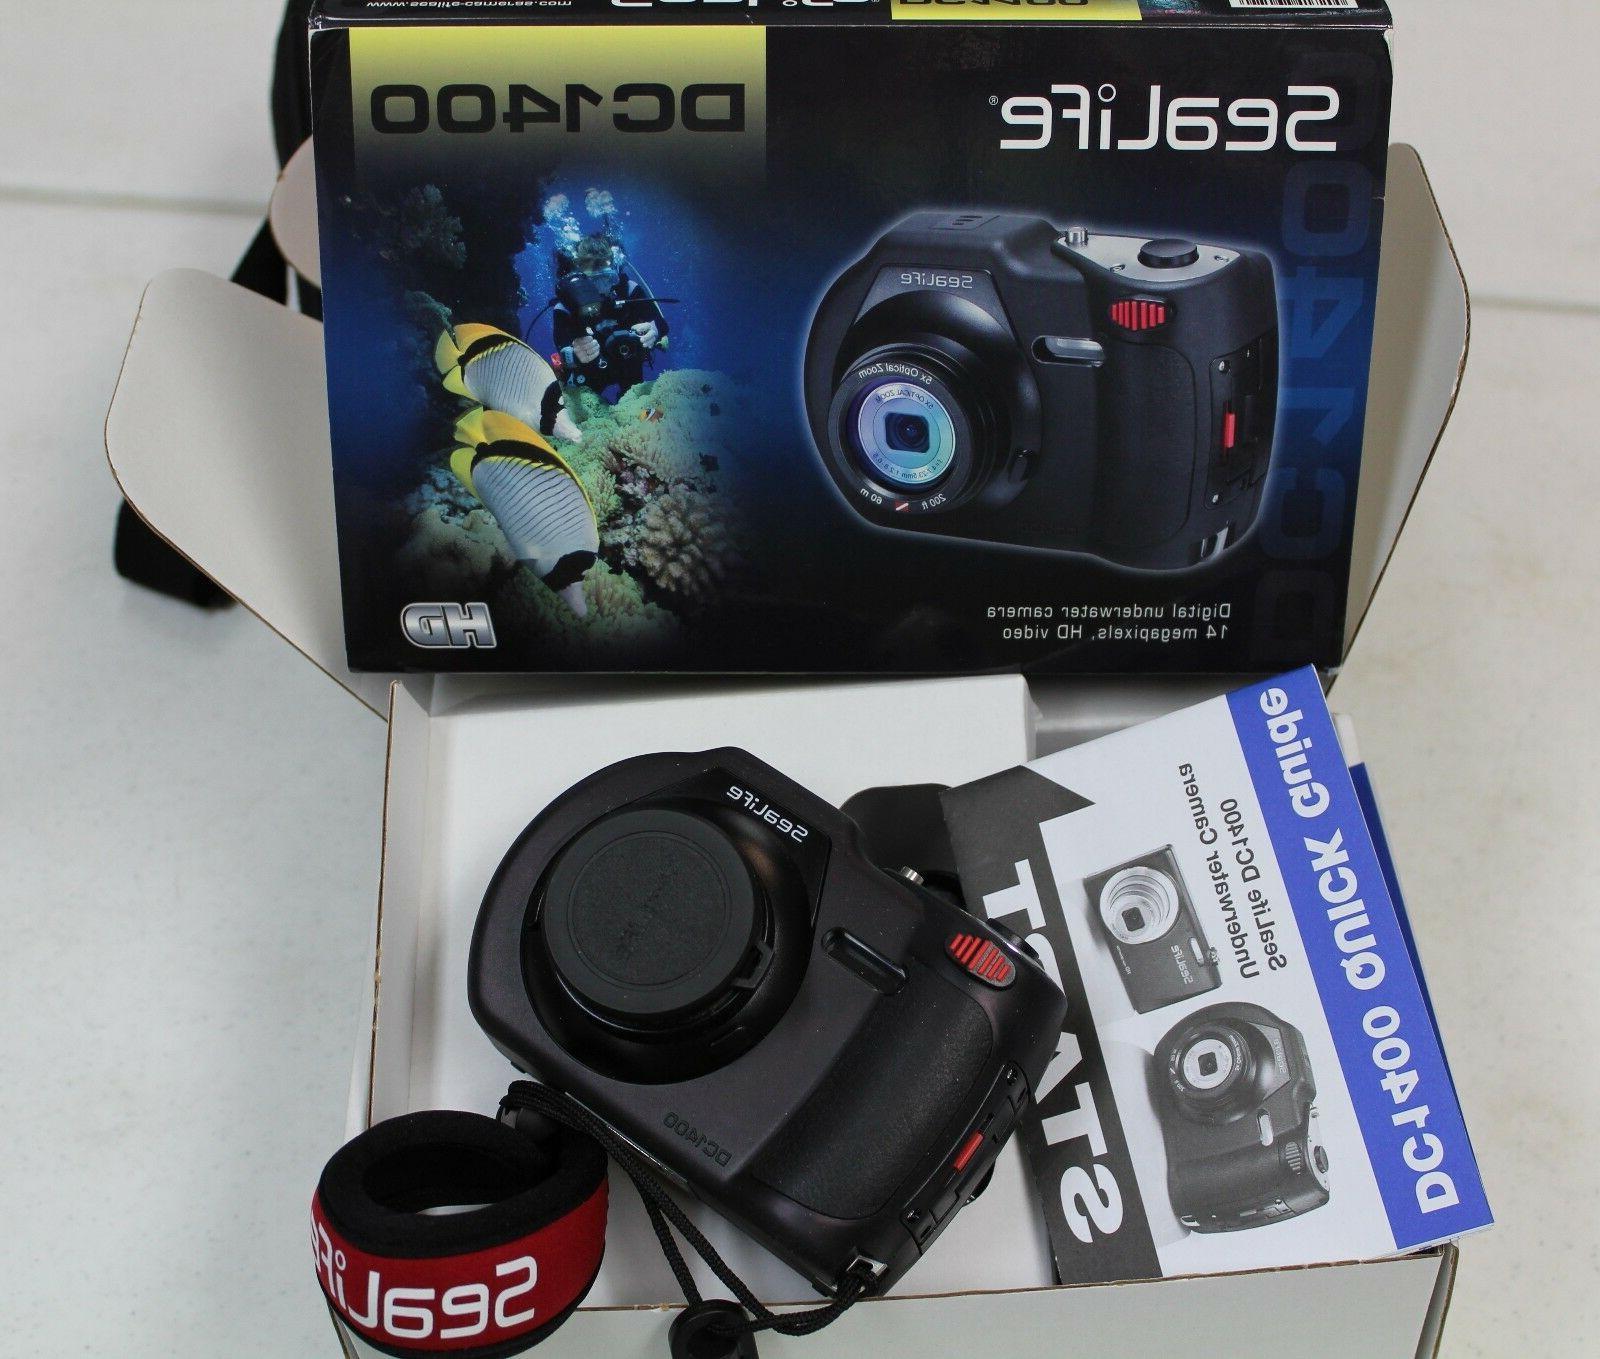 sealife dc1400 underwater digital camera with strobe